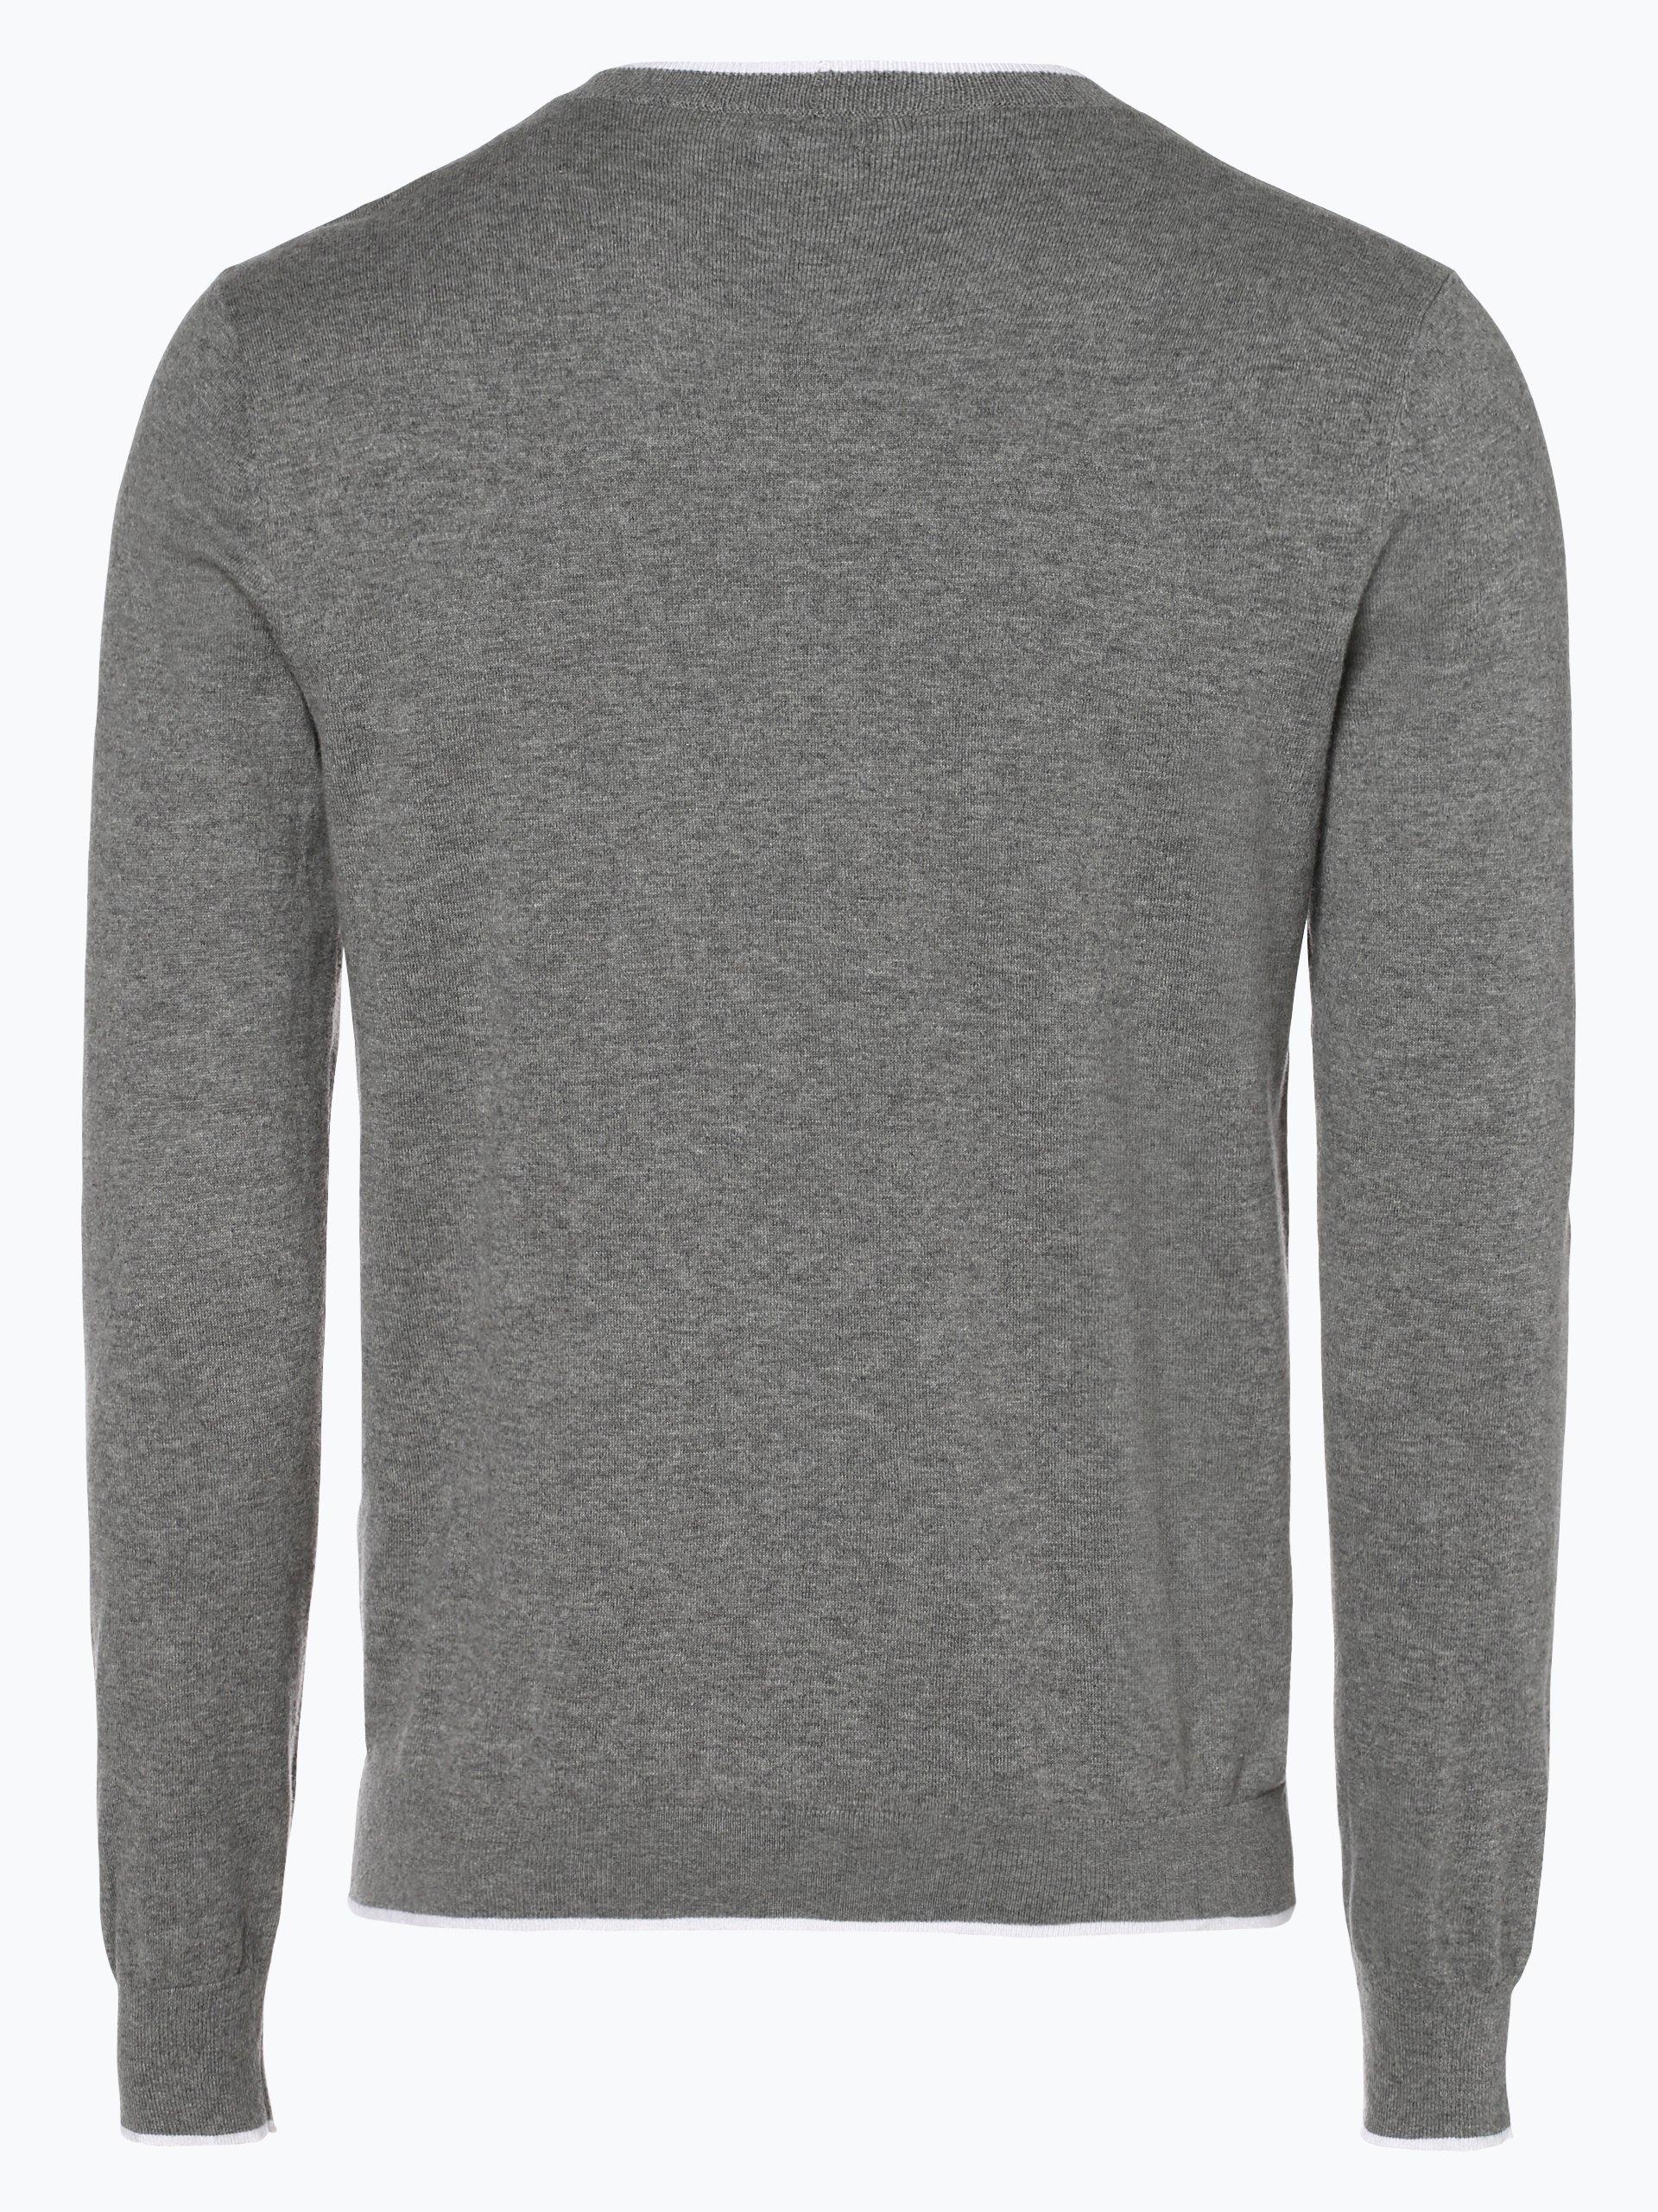 armani exchange herren pullover mit cashmere anteil online kaufen vangraaf com. Black Bedroom Furniture Sets. Home Design Ideas